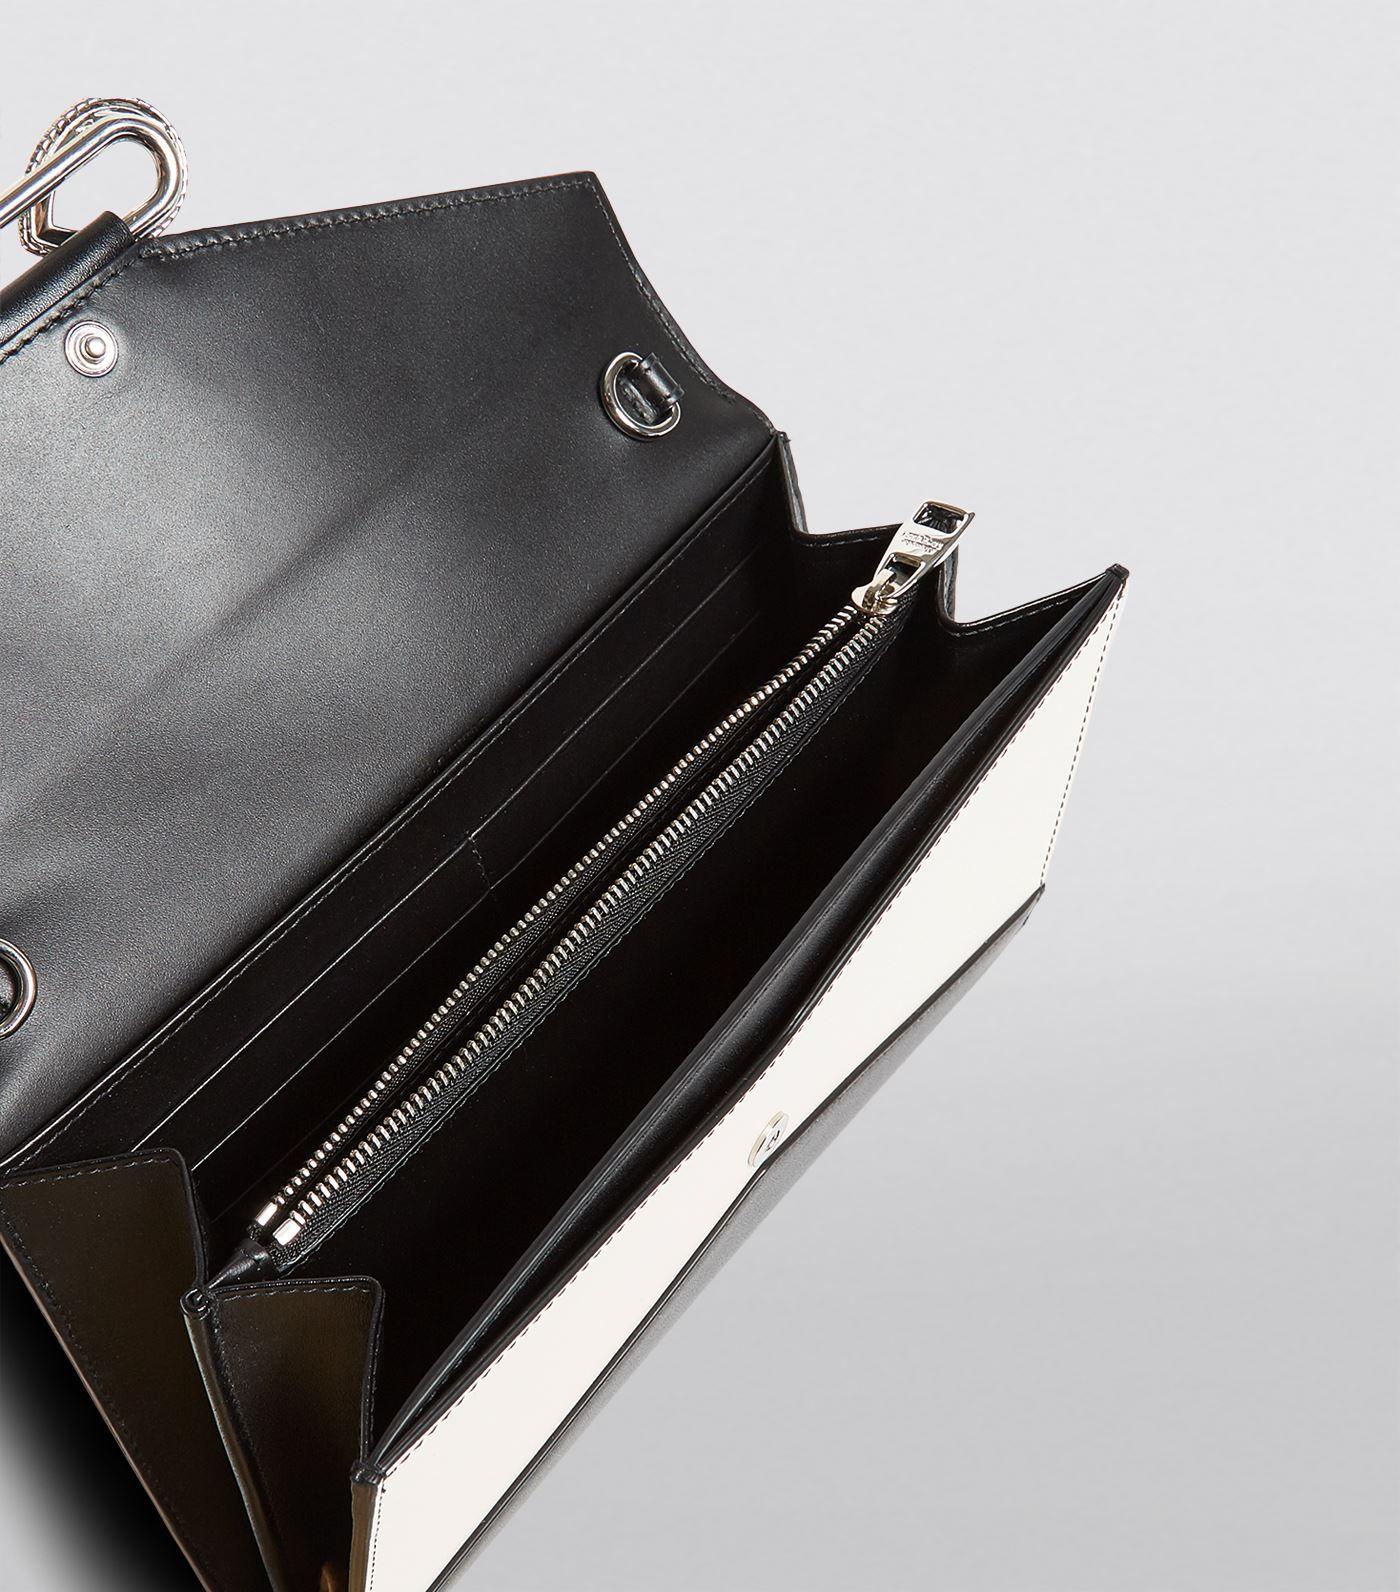 466a0efdb864 Leather Pin Wallet Bag in 2019 | Room | Wallet, Zip around wallet, Bags